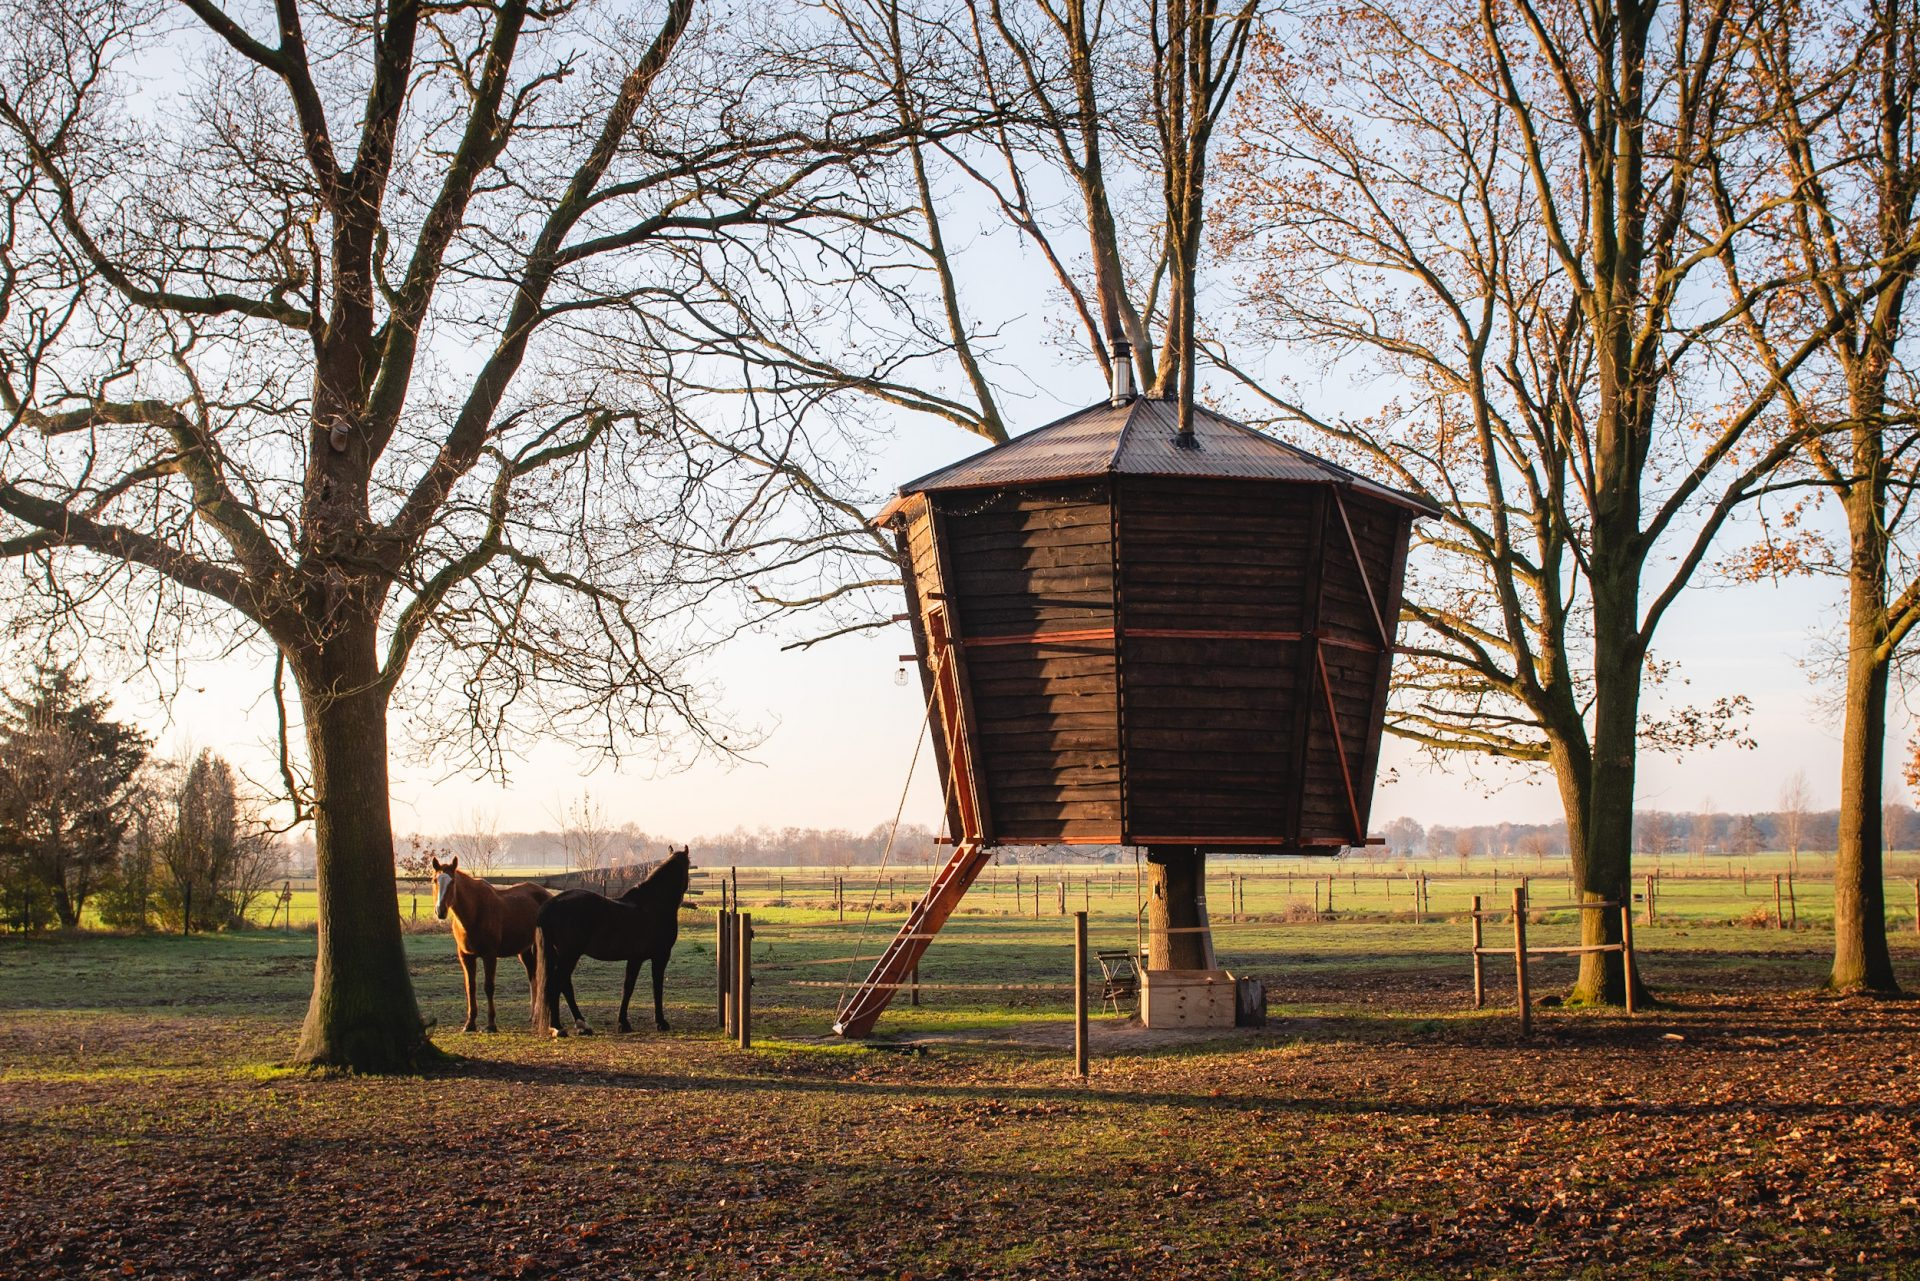 Treehouse-Goldsworthy-Achterhoek-boomhut